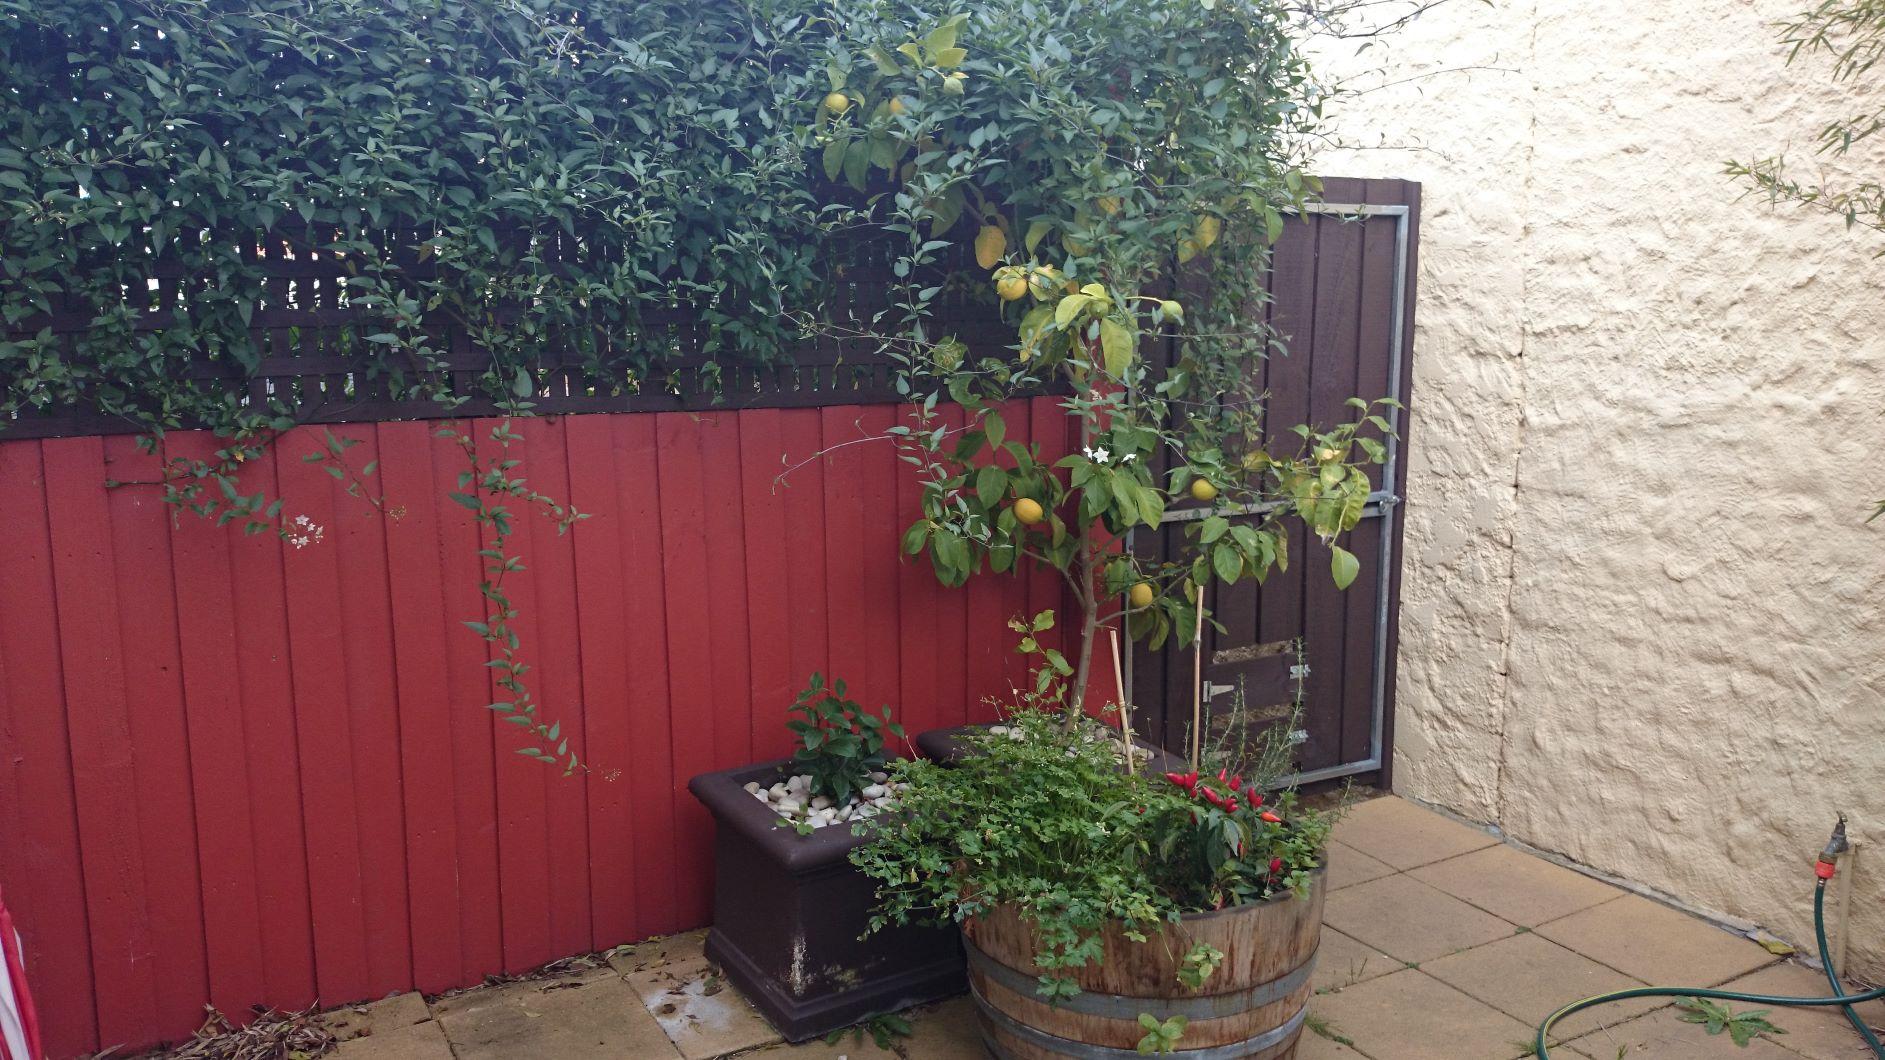 South Melbourne courtyard garden, Before photo uglyness